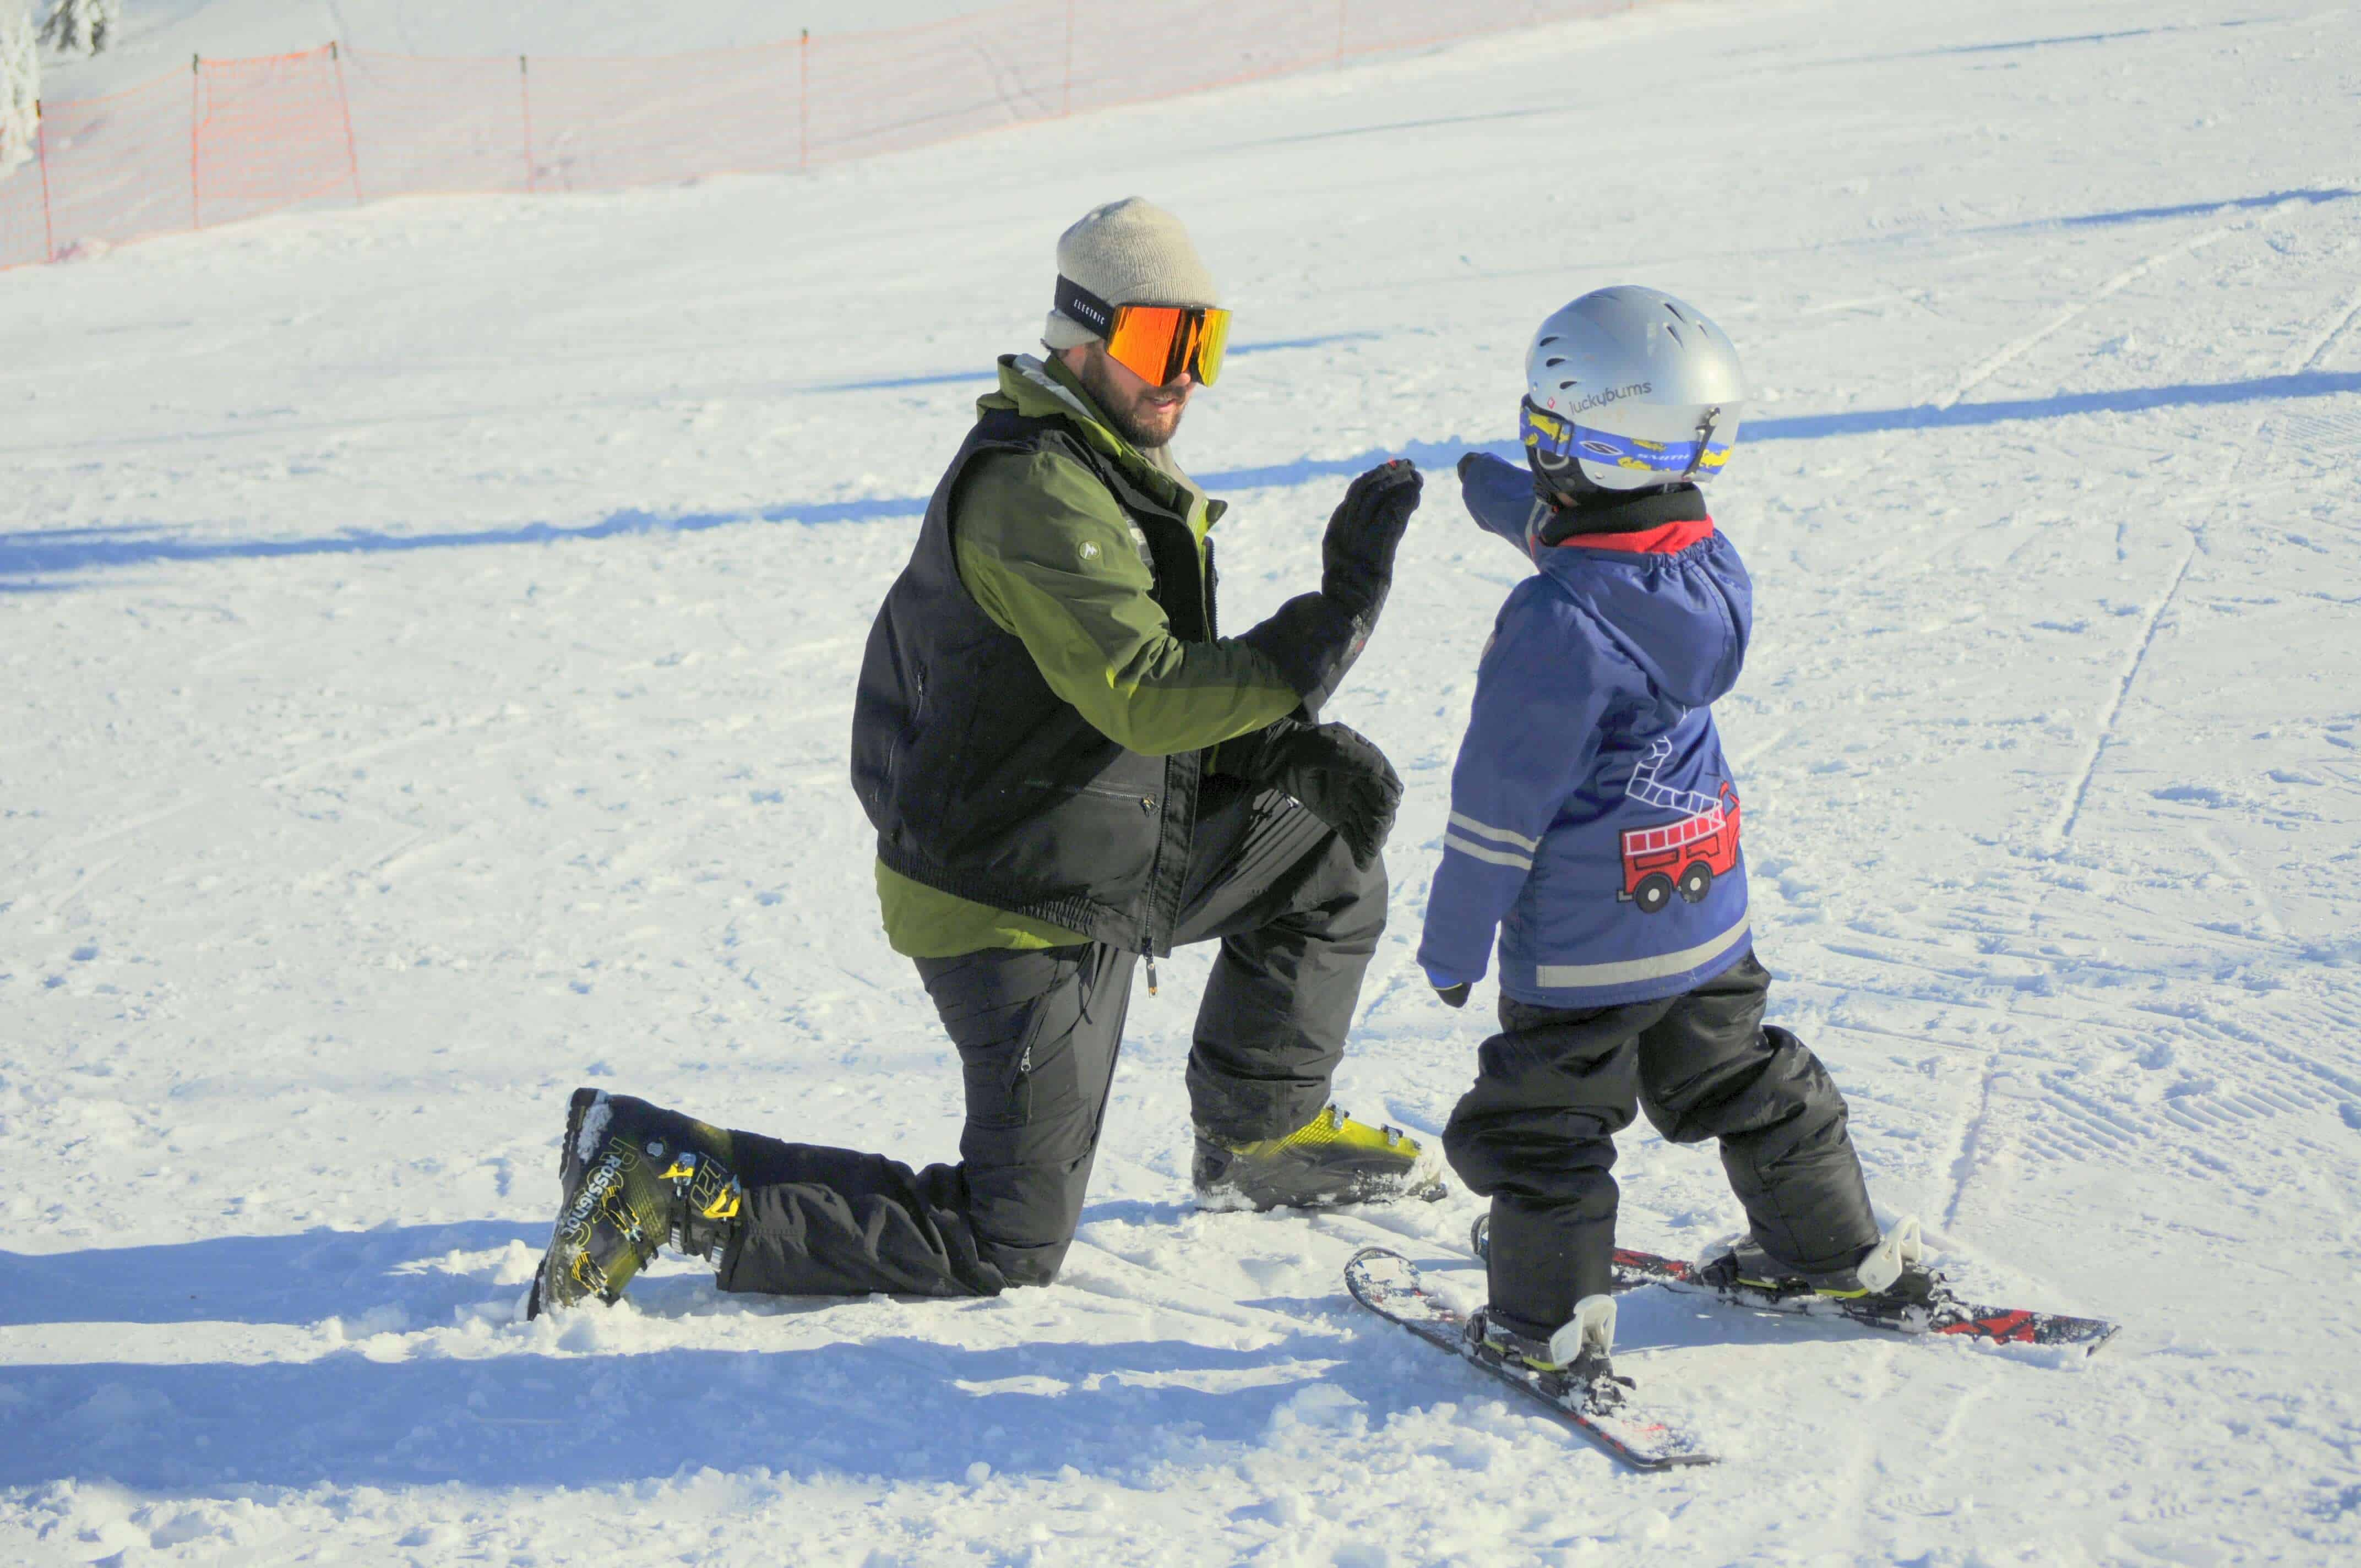 Mt. Ashland Ski School